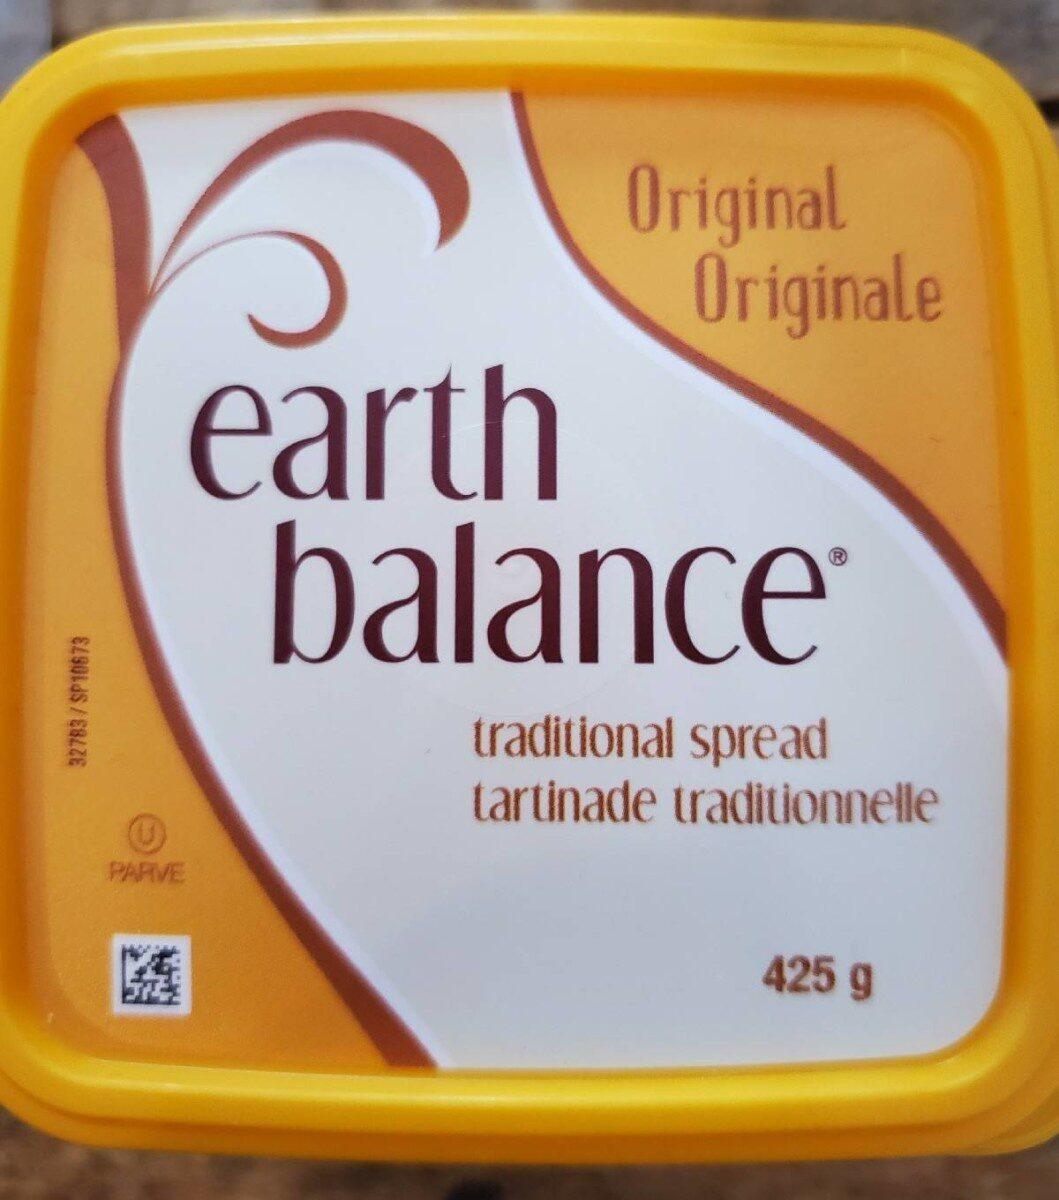 Earth balance - Product